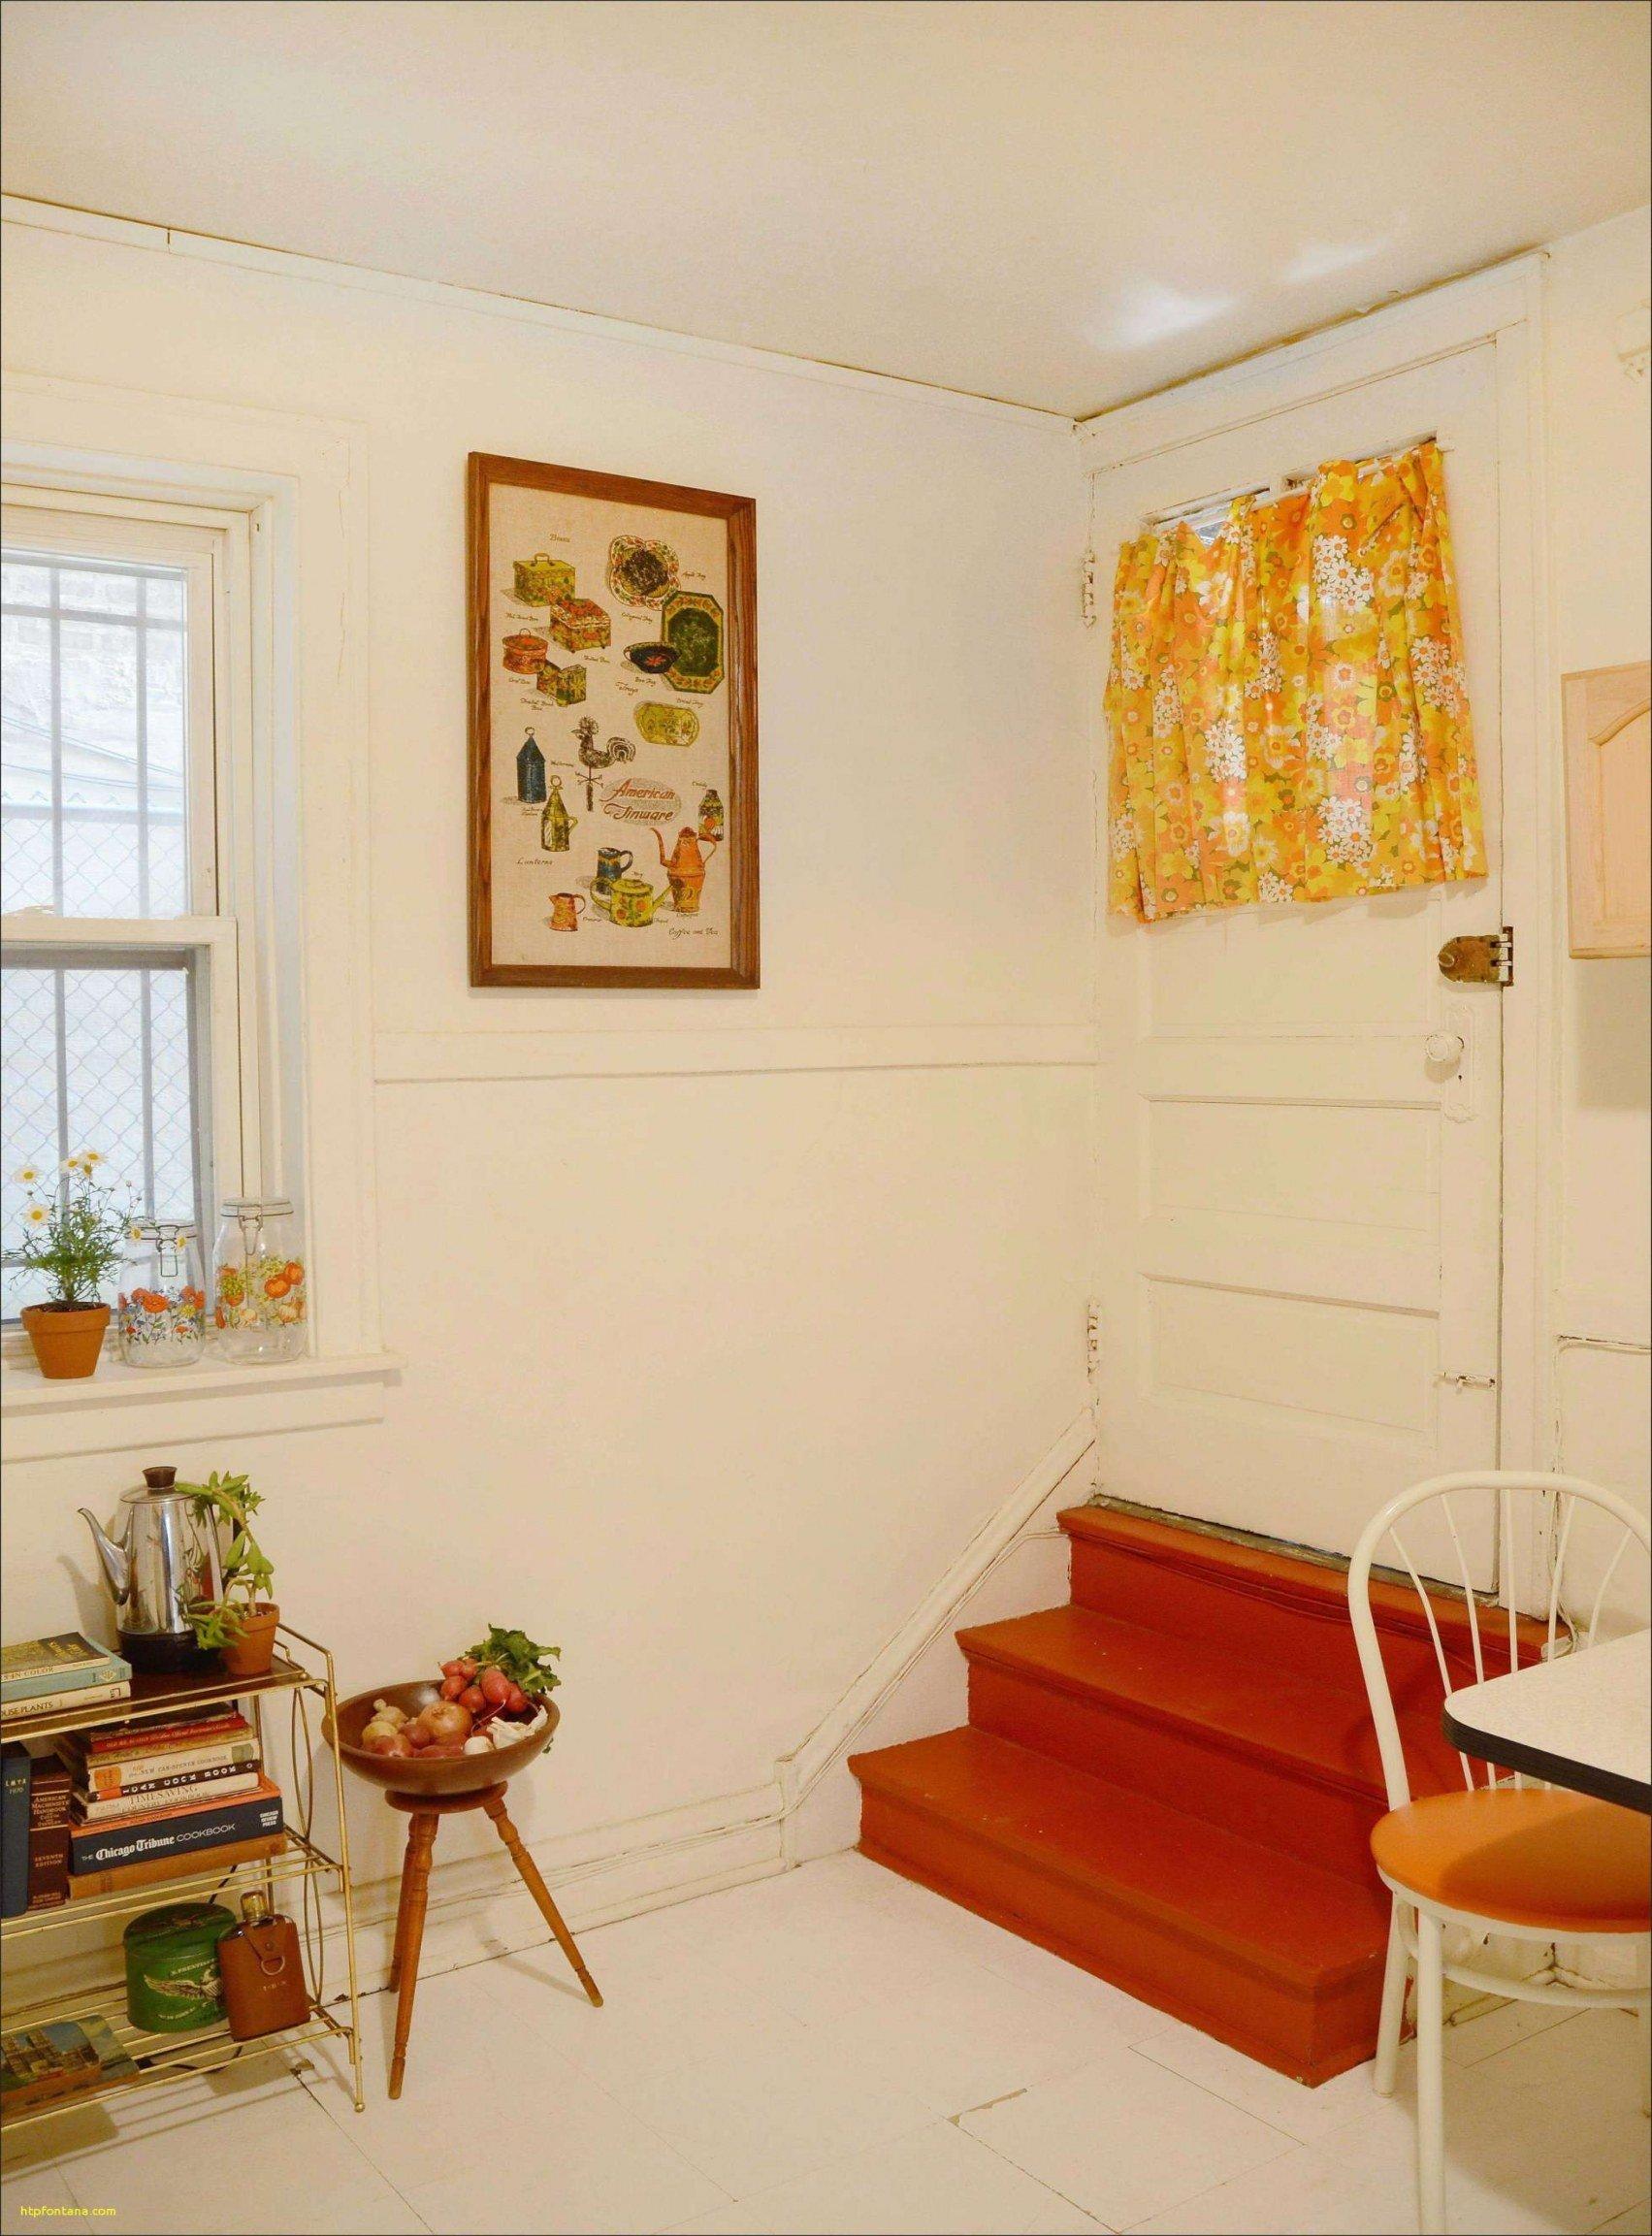 Rustic Bedroom Wall Decor Luxury Wall Decor Ideas 44 Beautiful Bedroom Decor Ideas 2019